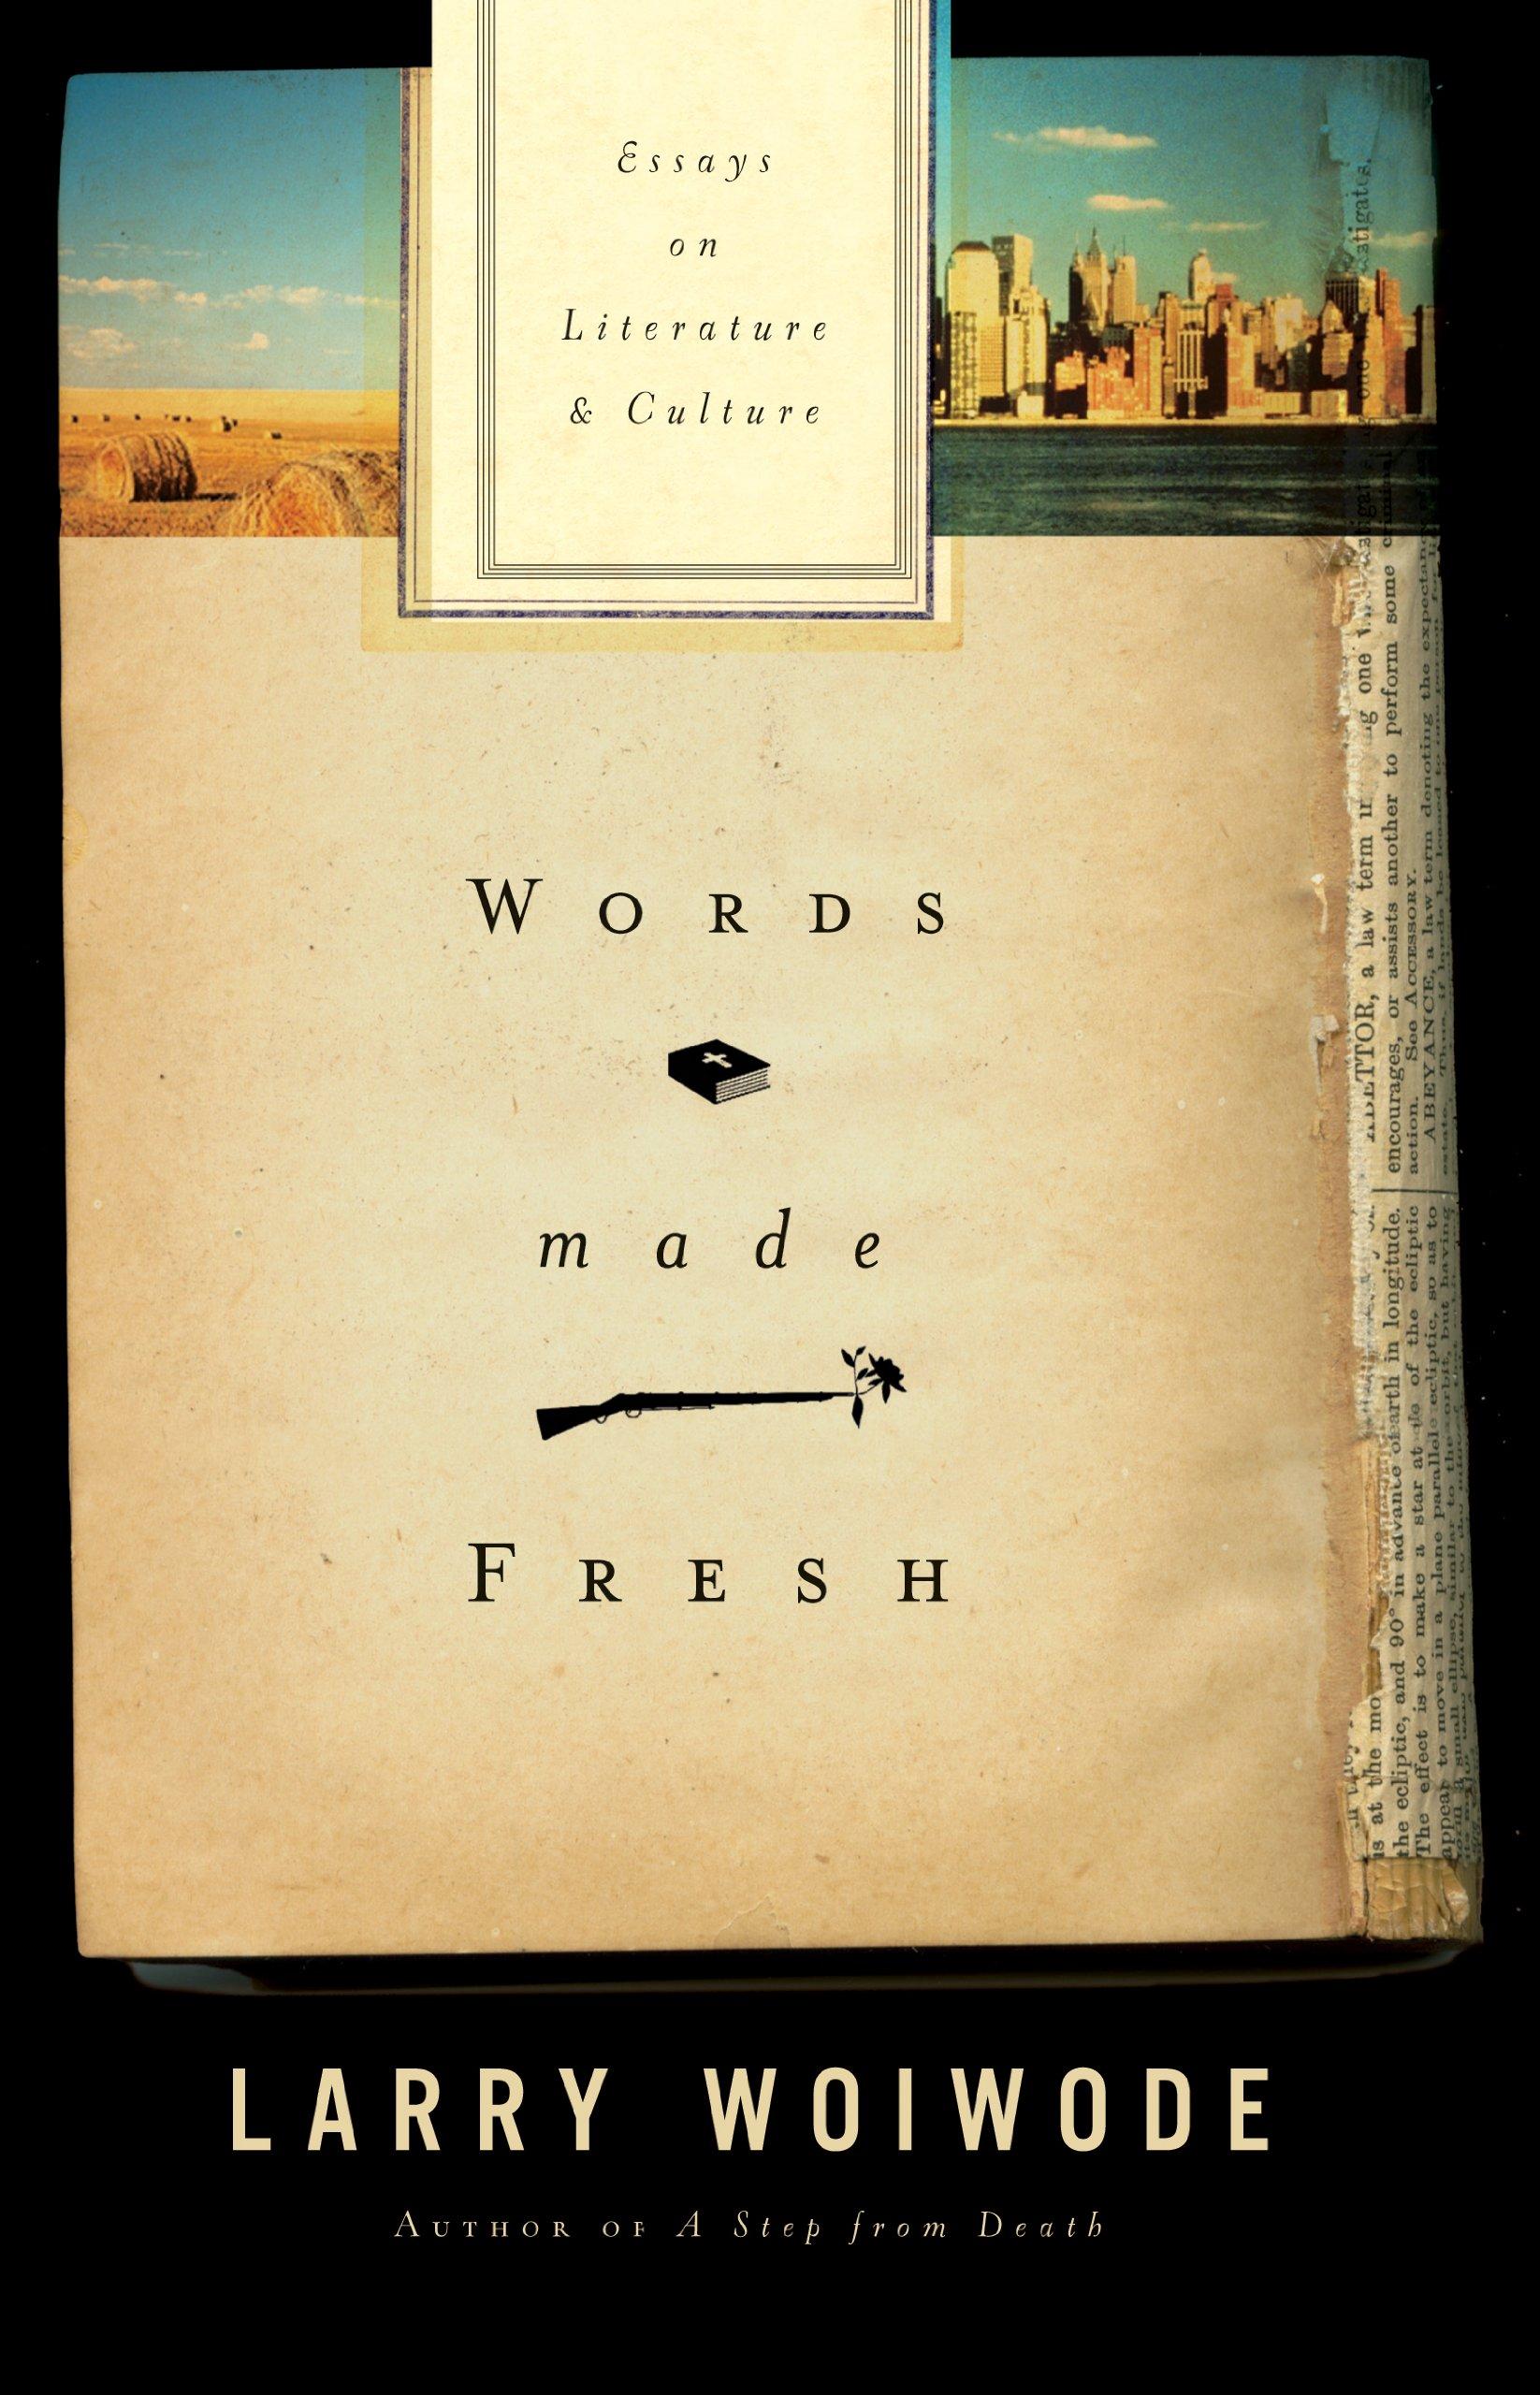 007 812bum Ji26l Fresh Essays Essay Wondrous Contact Uk Full